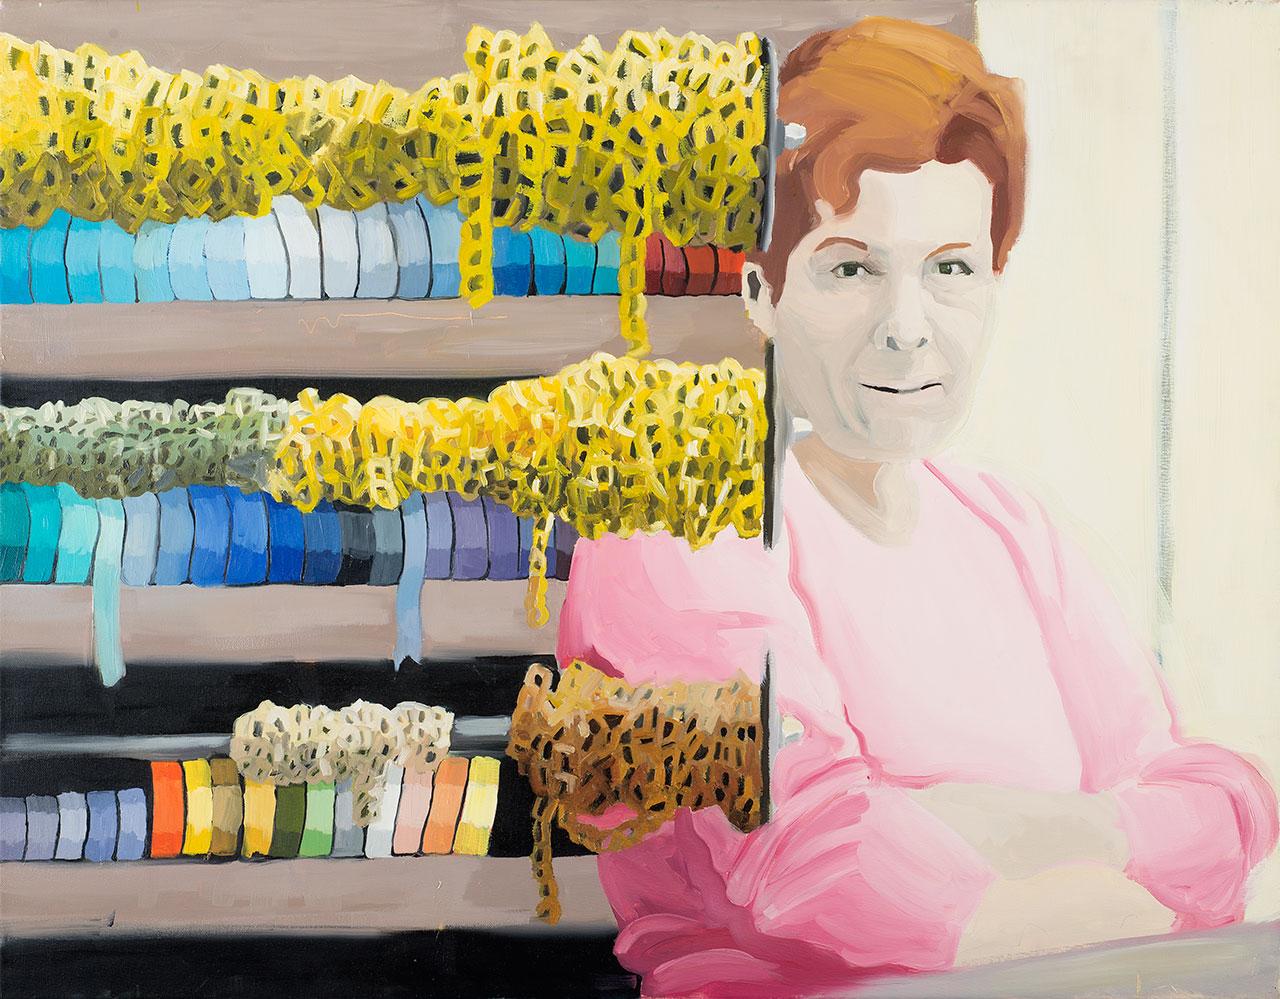 Homesickness (κυρία ροζ), 2006, ακρυλικό σε καμβά, 70x90 εκ.